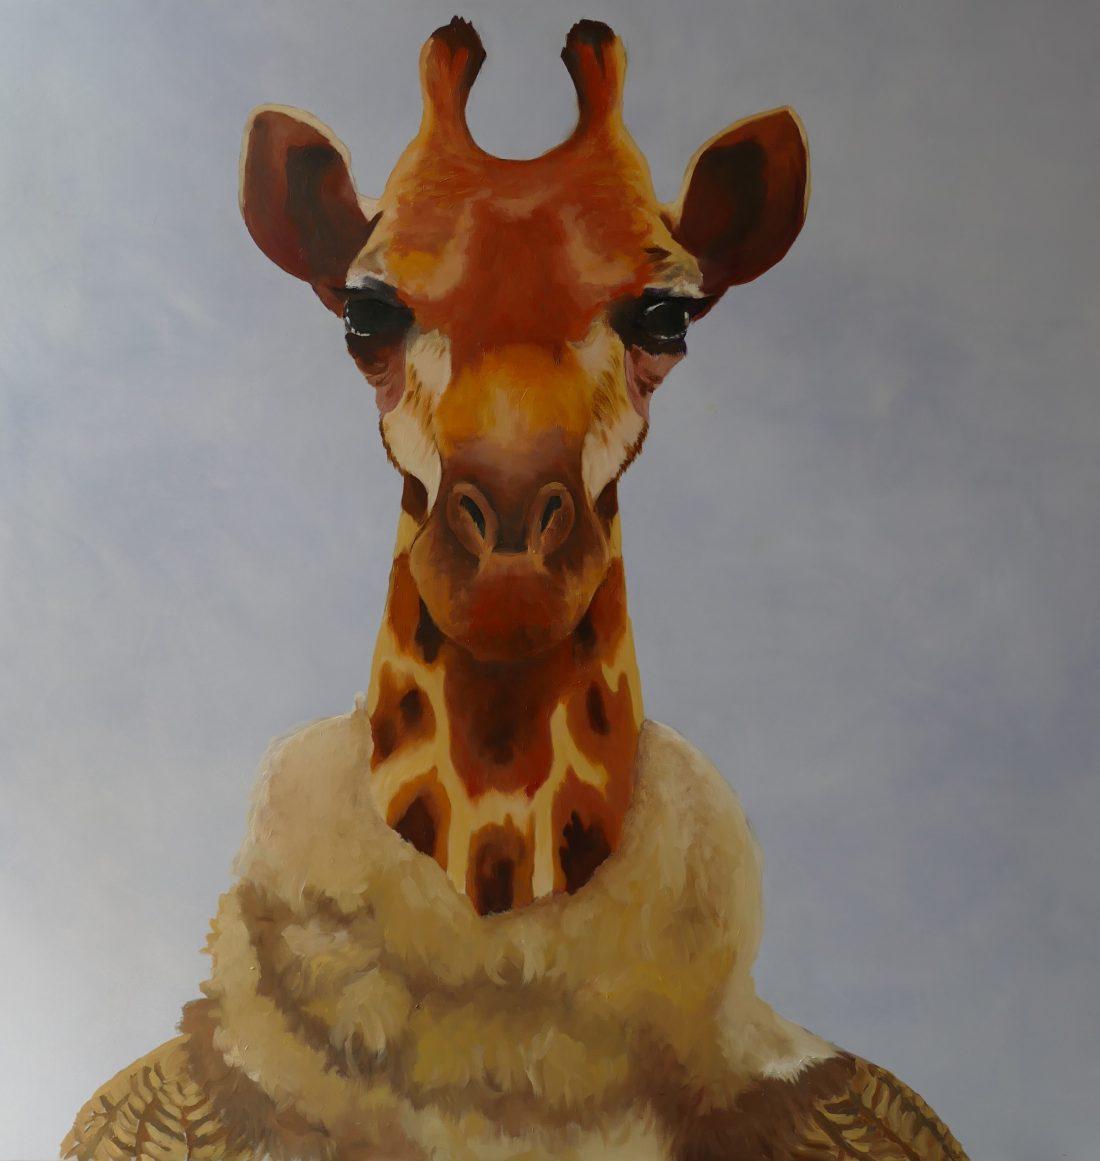 Paquita, la jirafa friolera